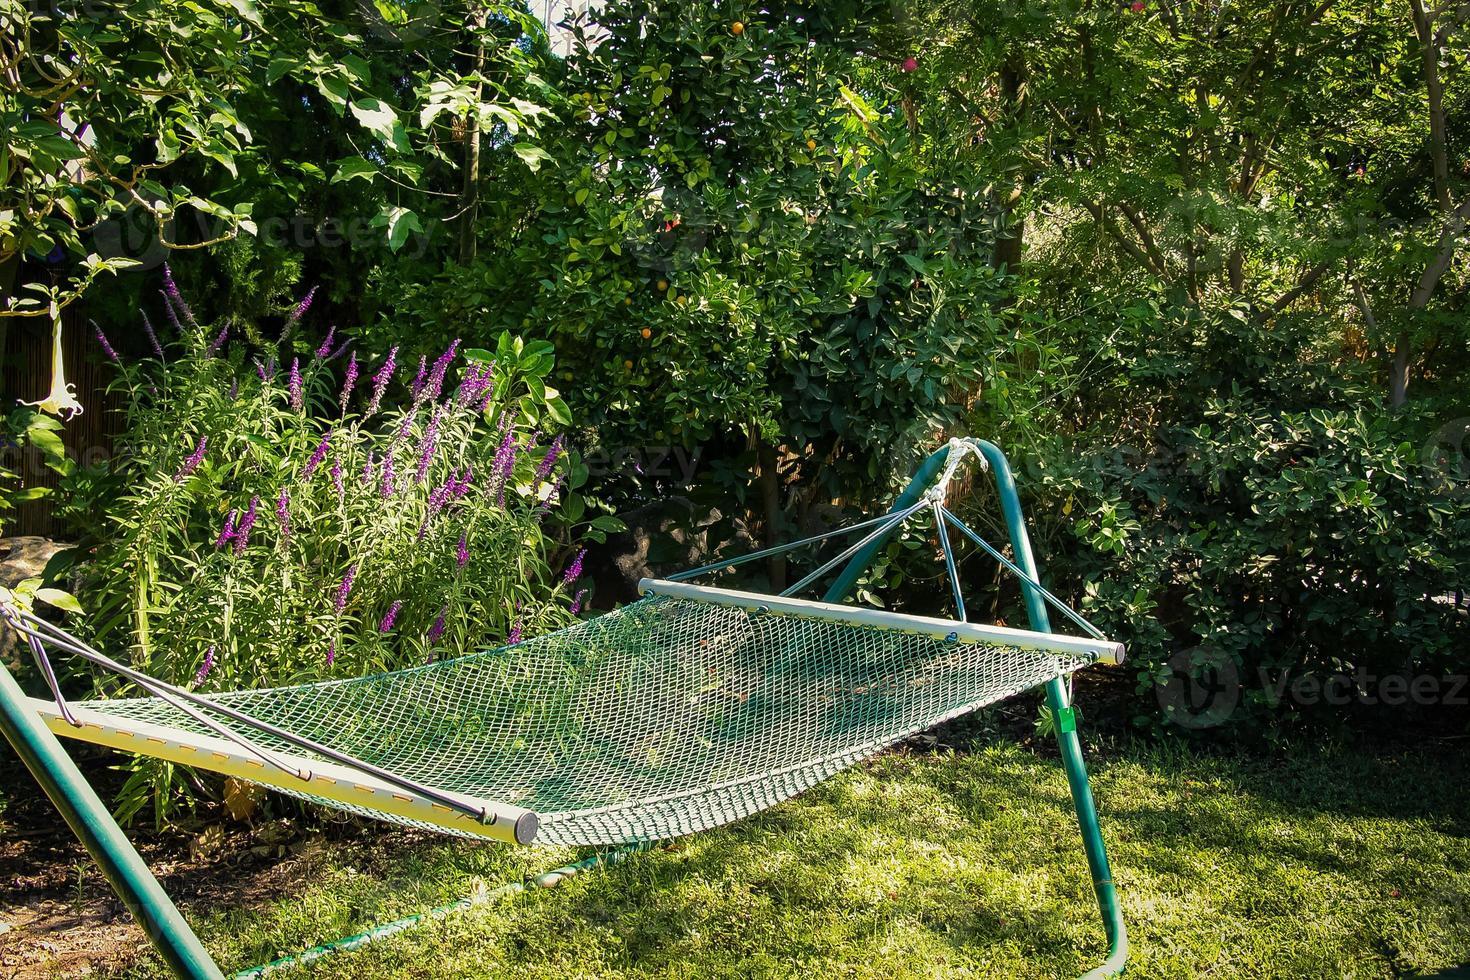 amaca in giardino verde foto